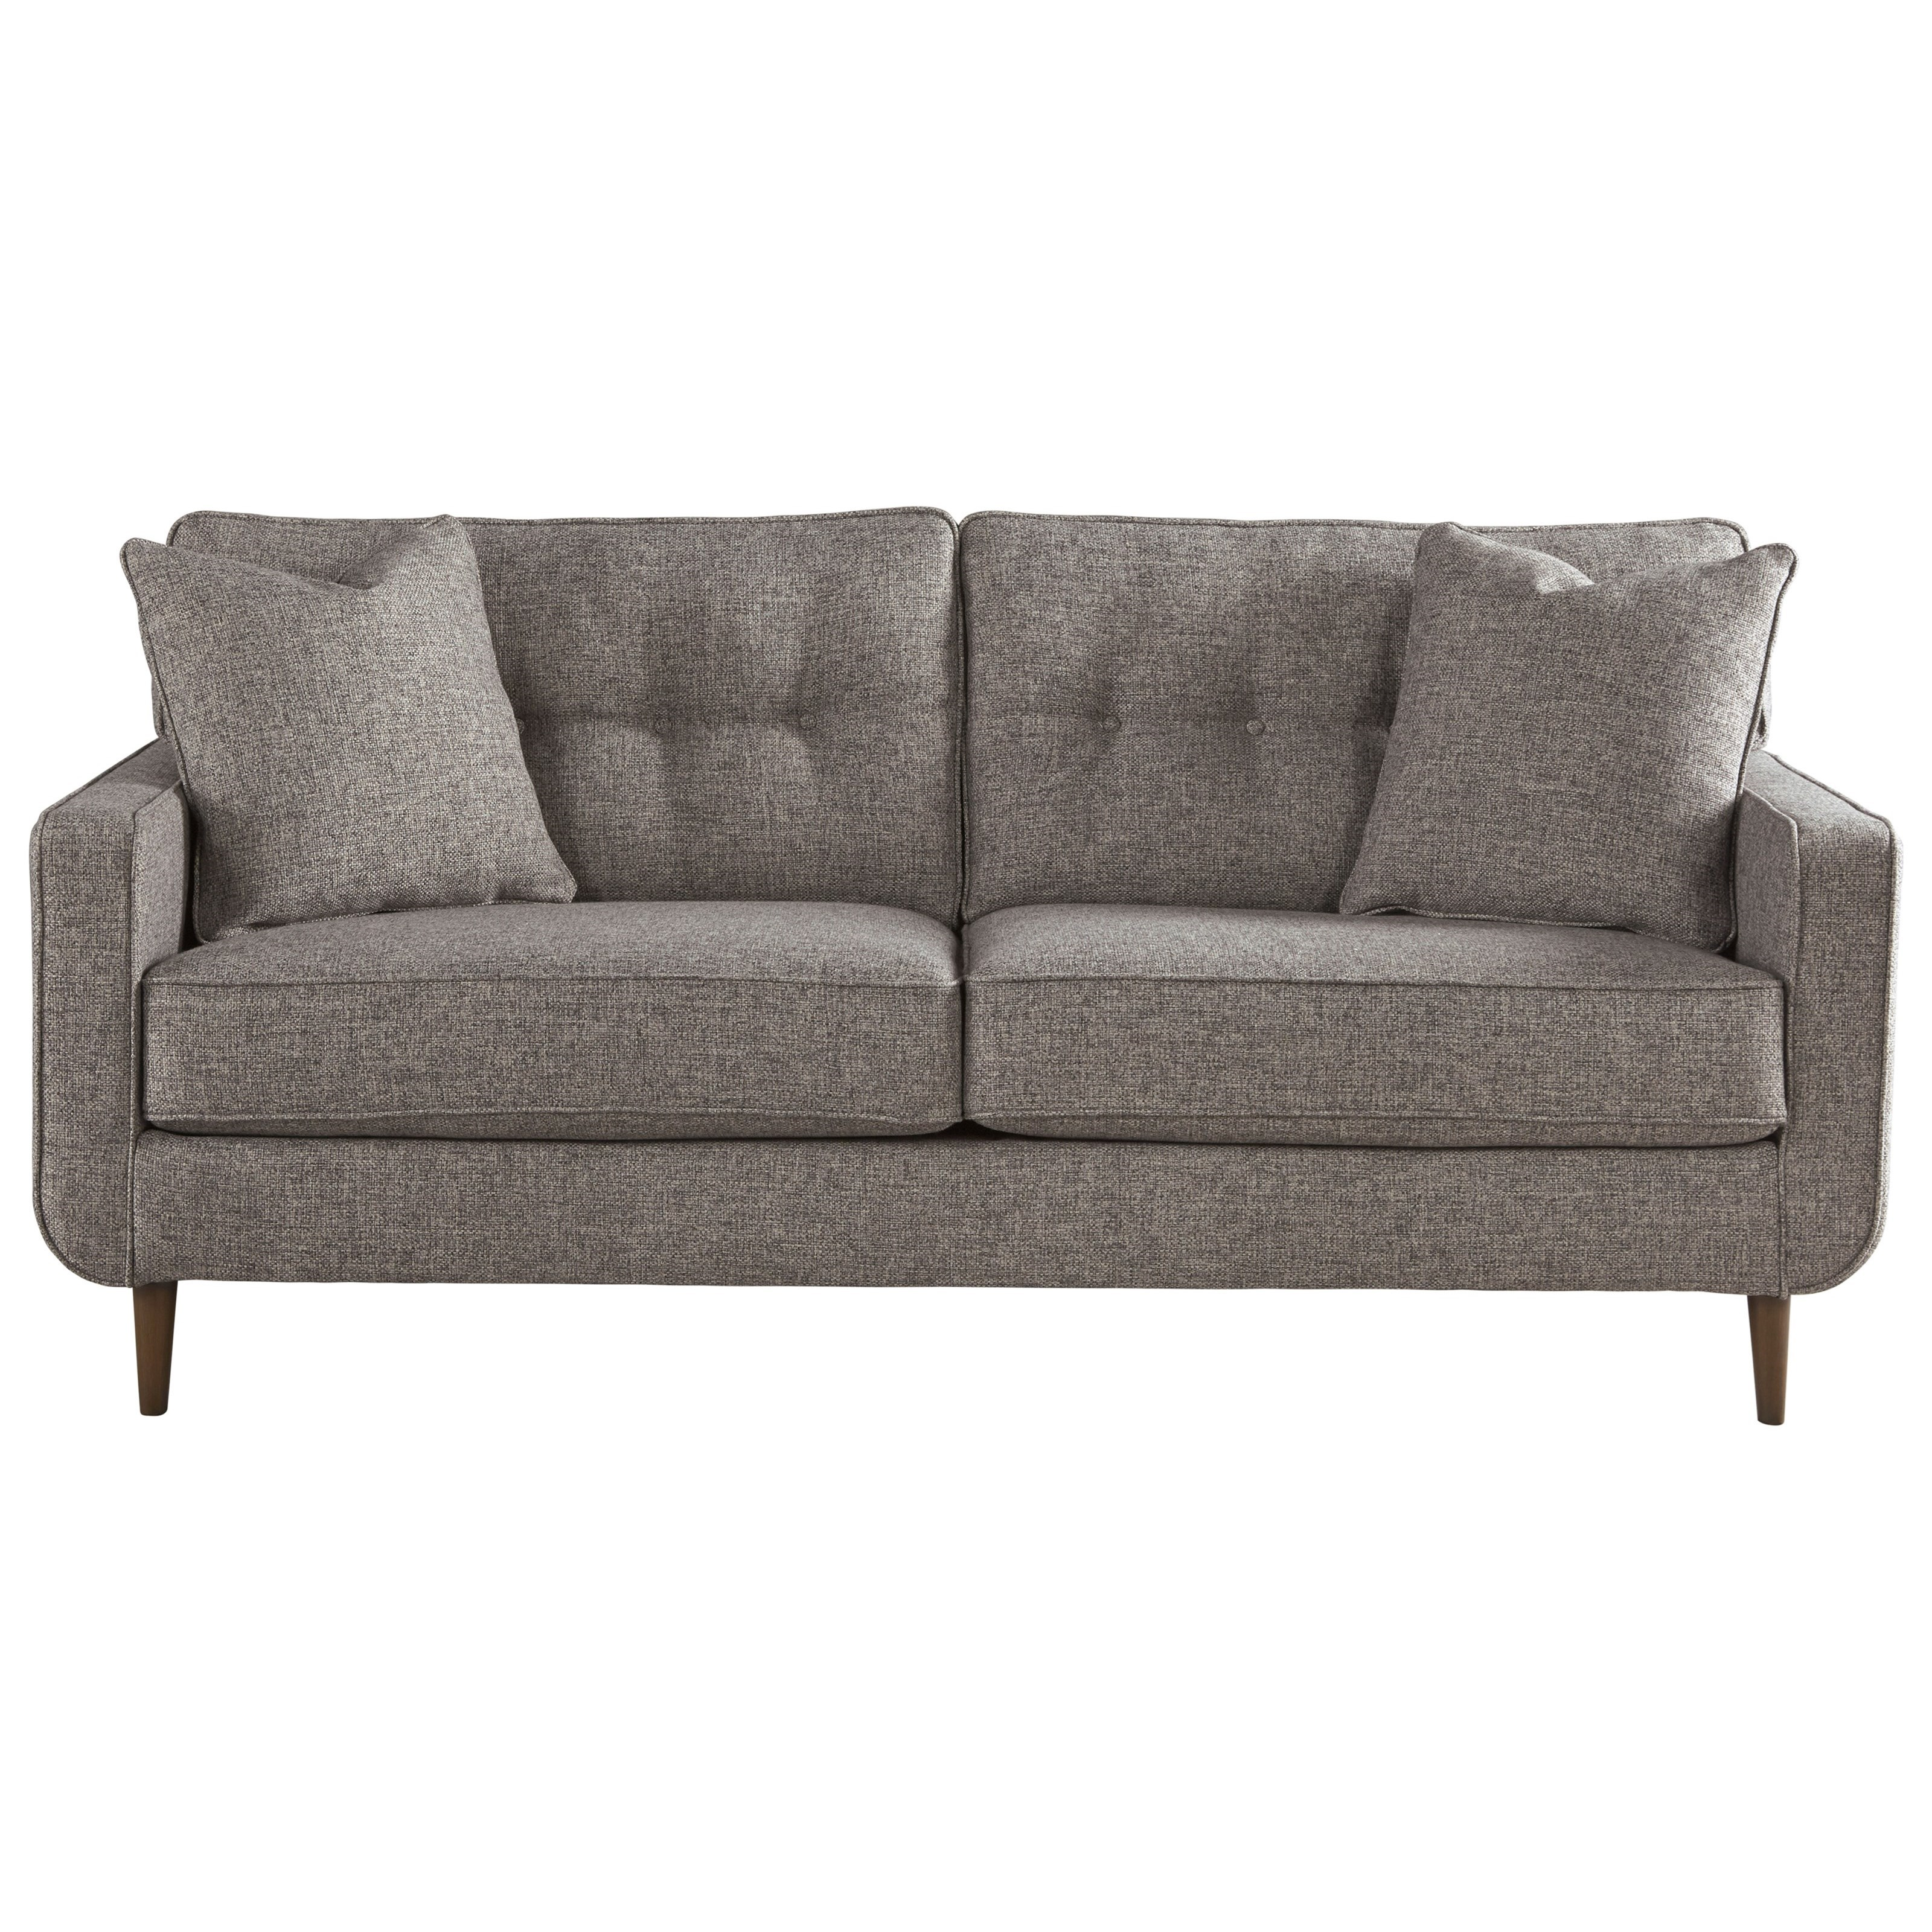 ashley furniture modern sofa end tables australia zardoni mid century olinde